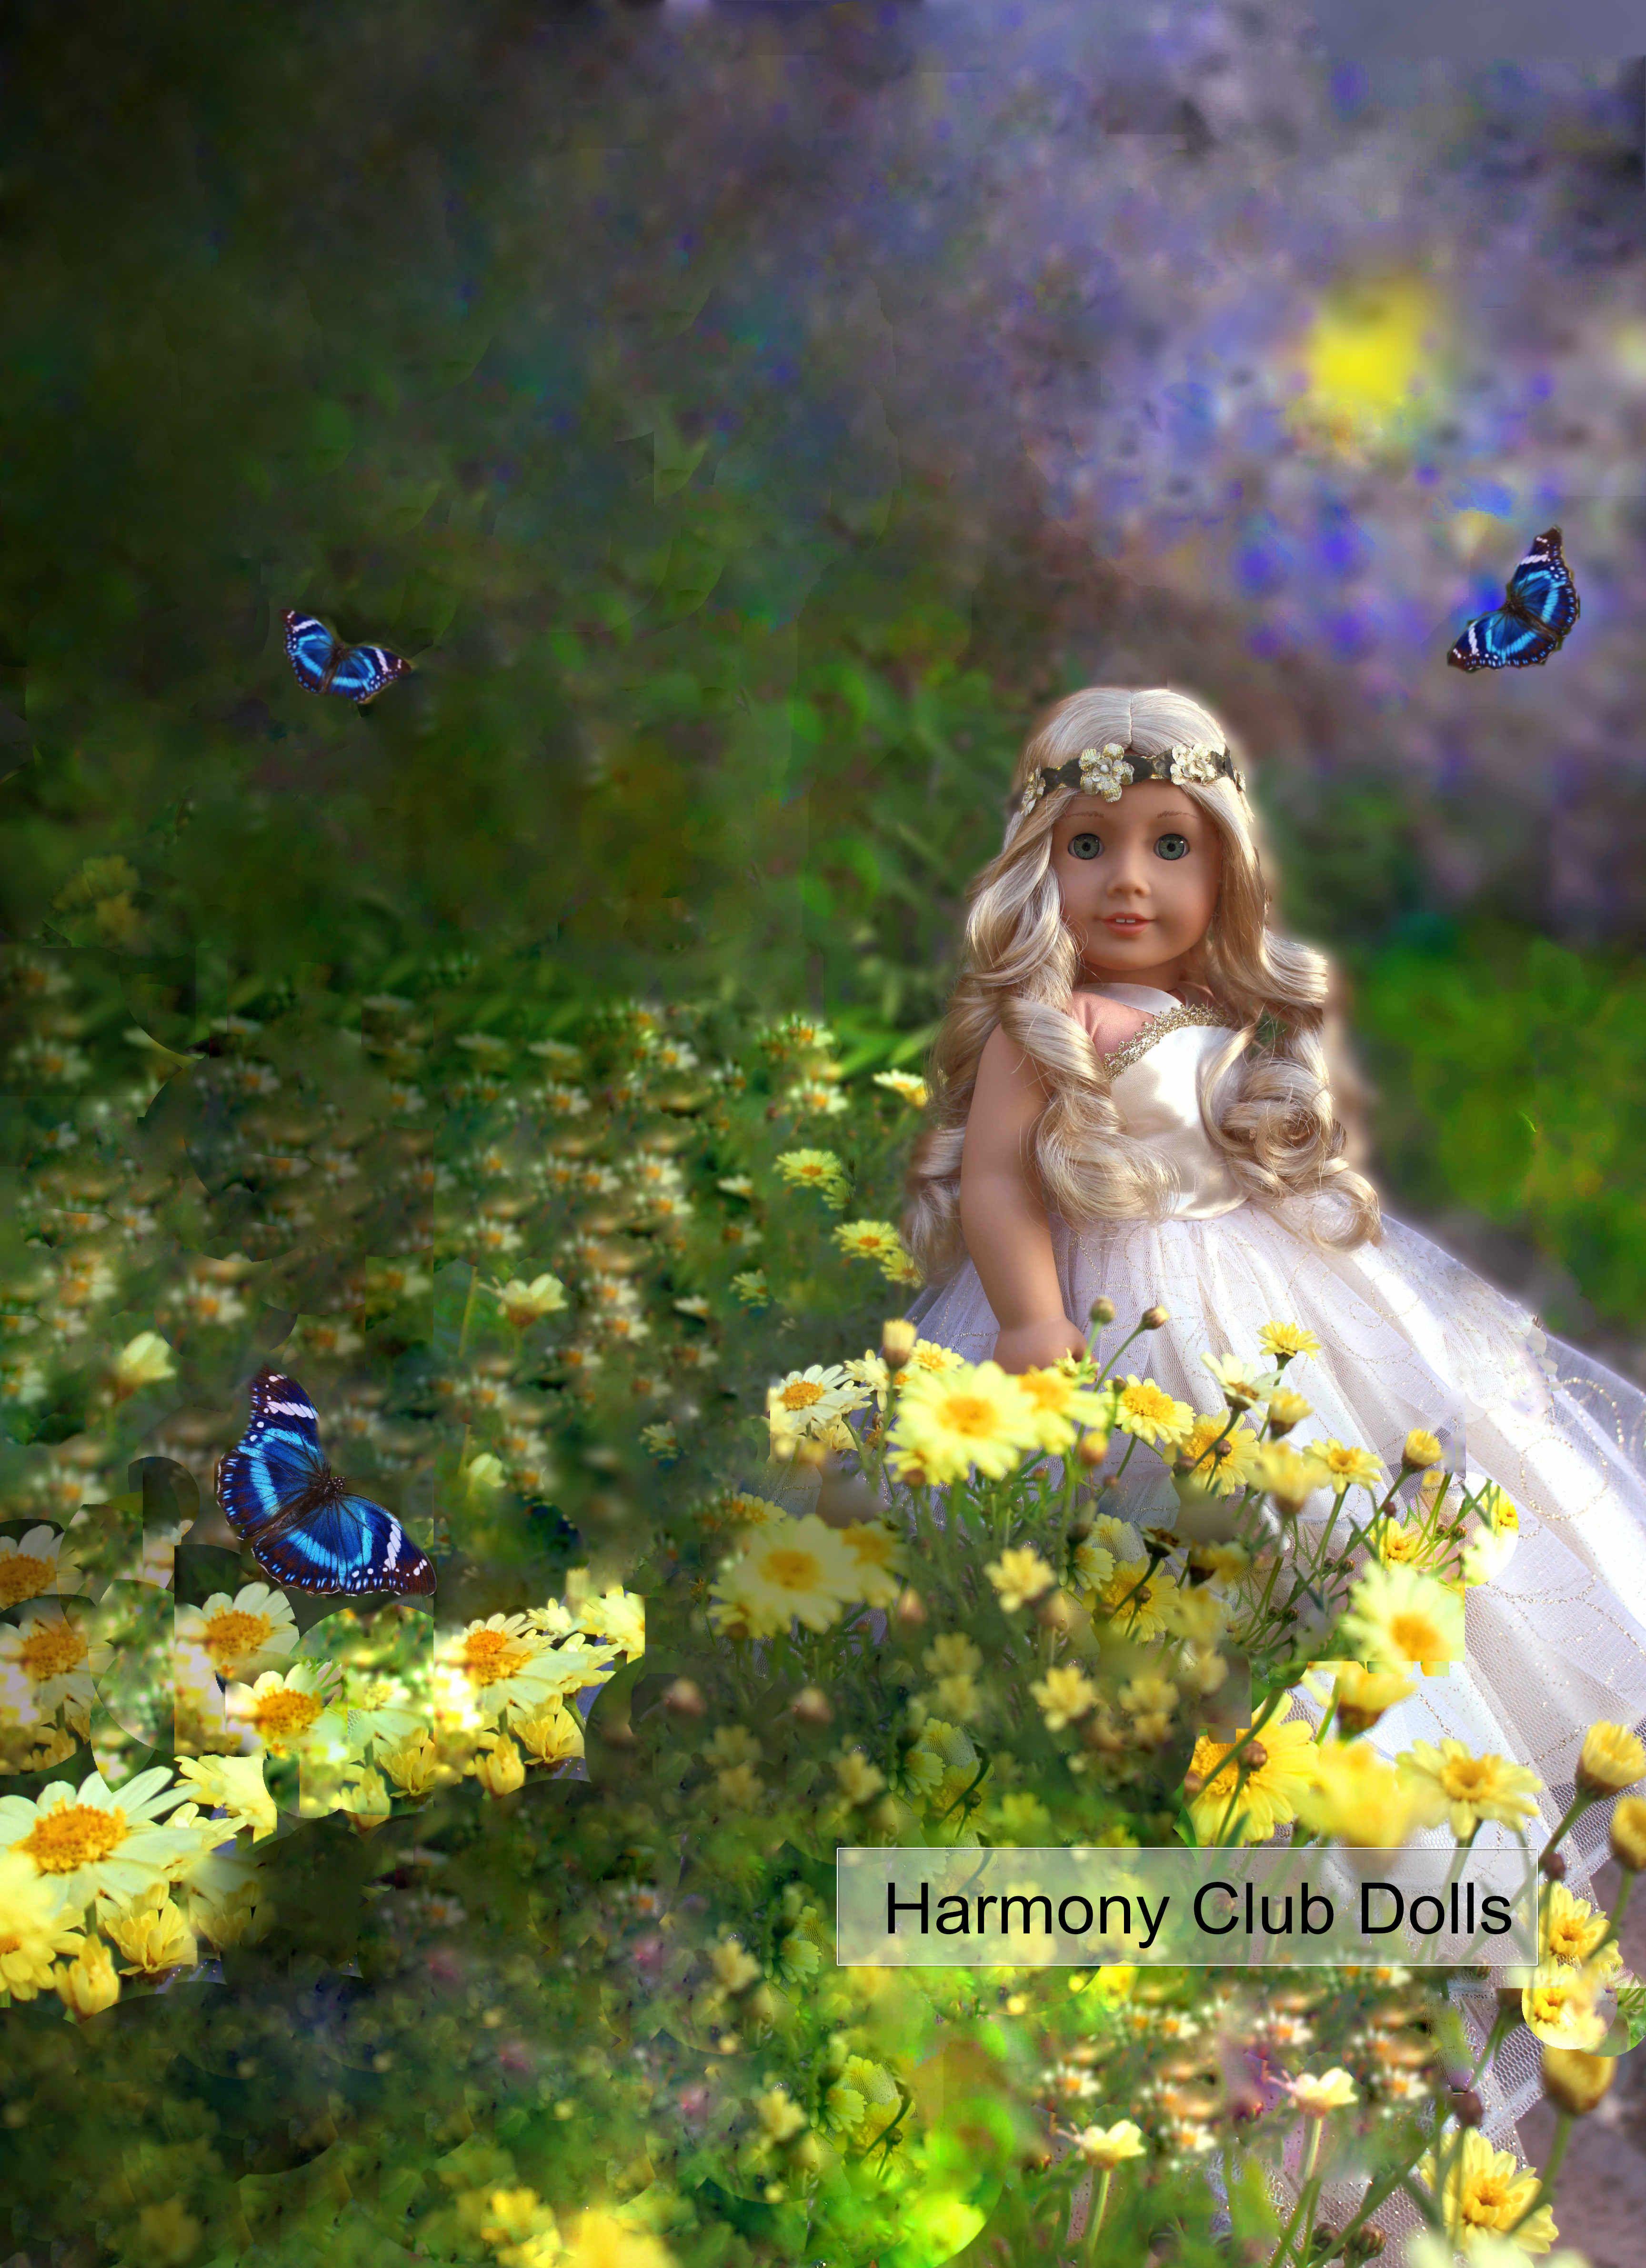 4f241dc8d0 Shop over 300 styles to fit American Girl Dolls www.harmonyclubdolls.com